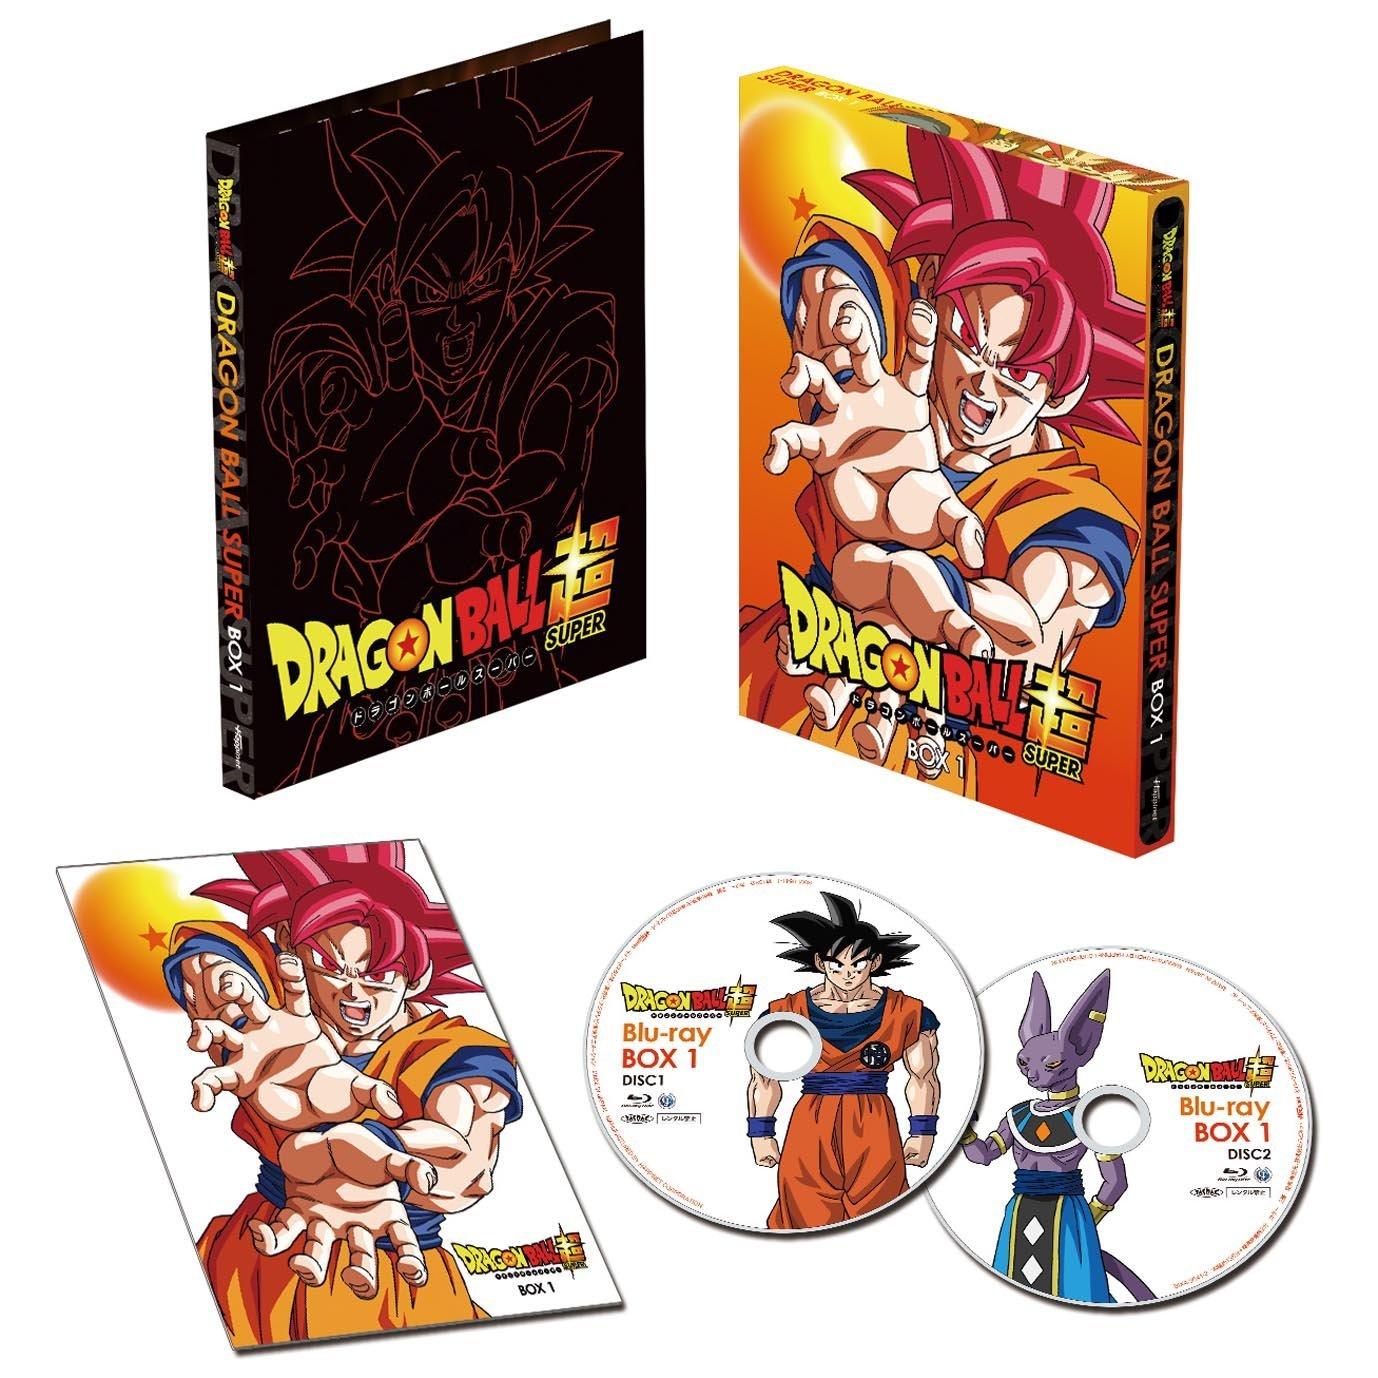 Dragonball Dvd Box